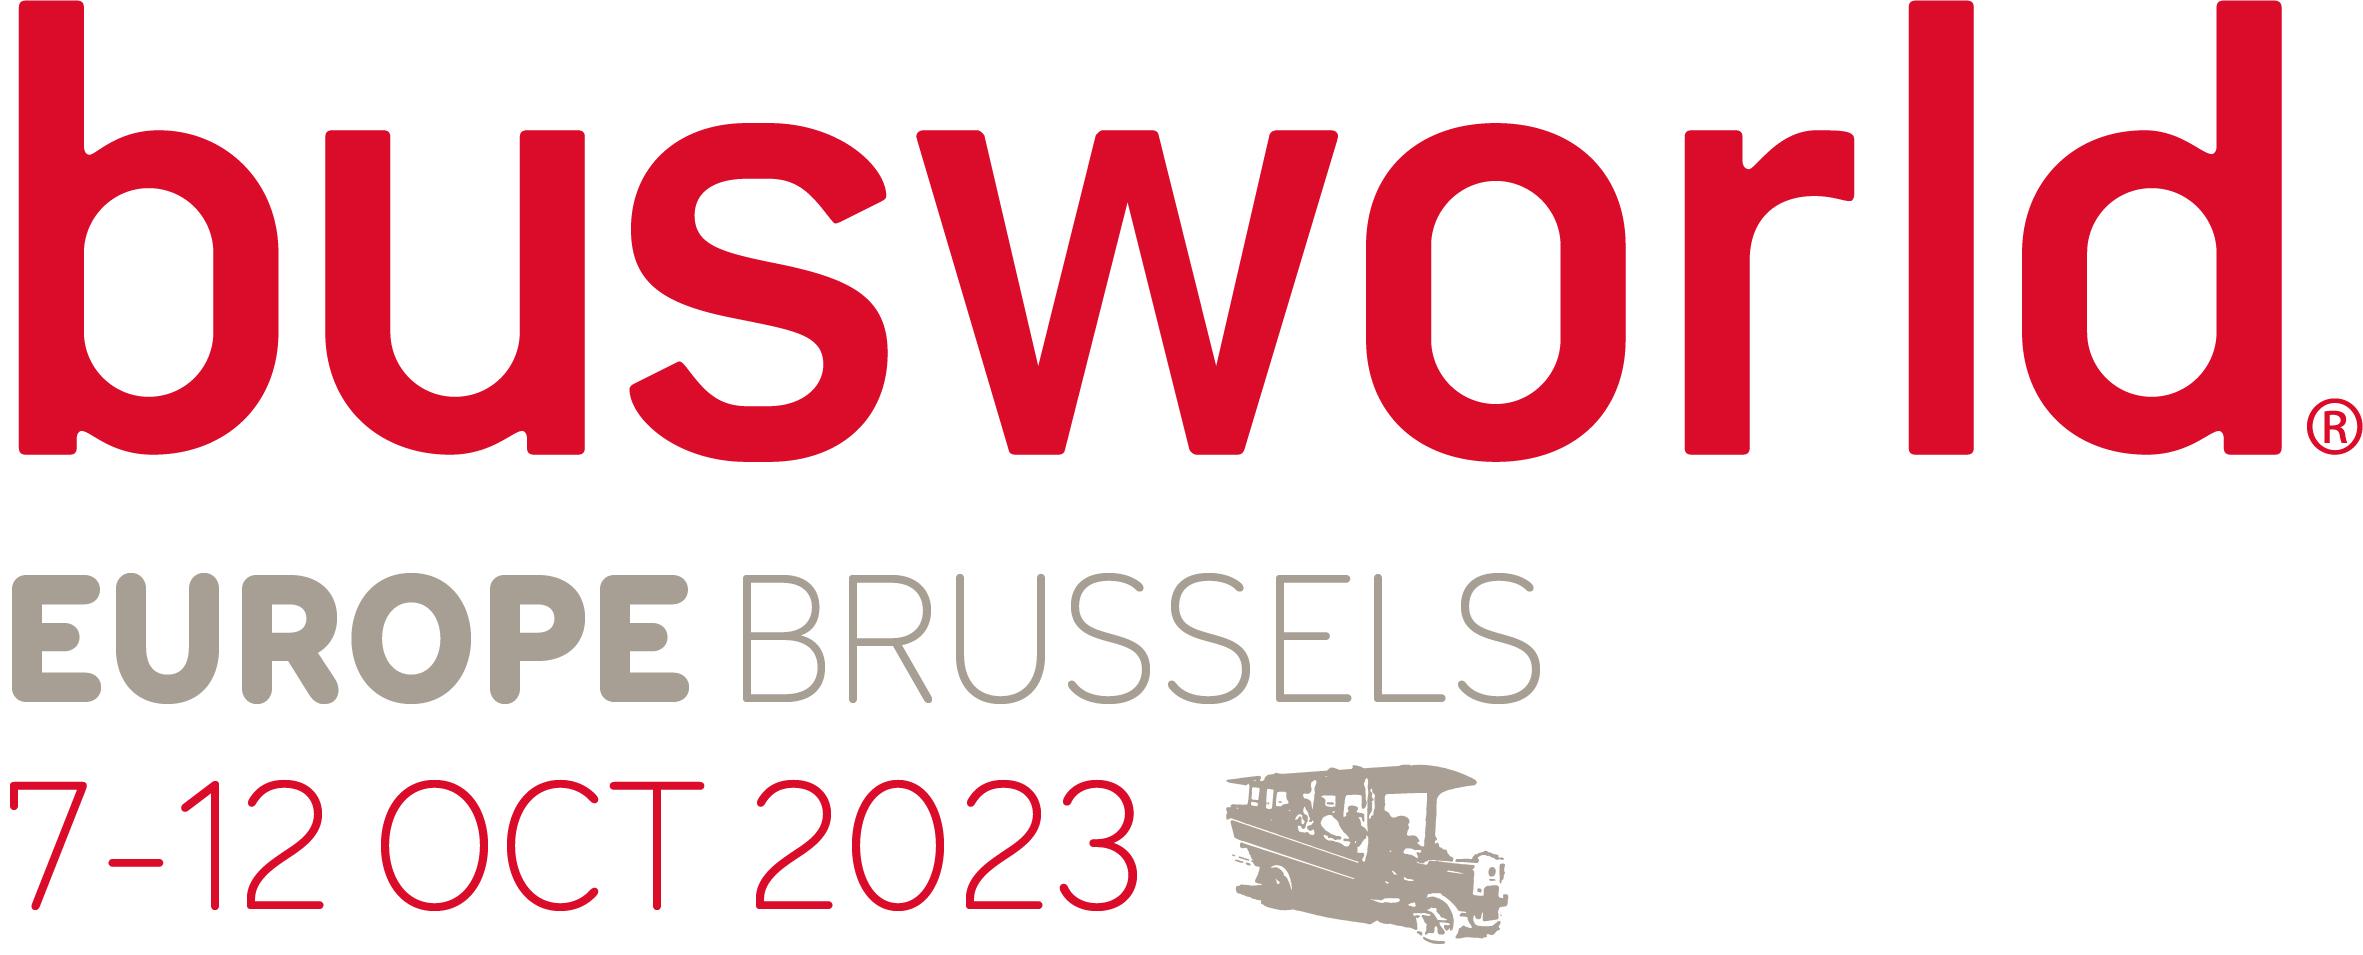 Busworld-logo